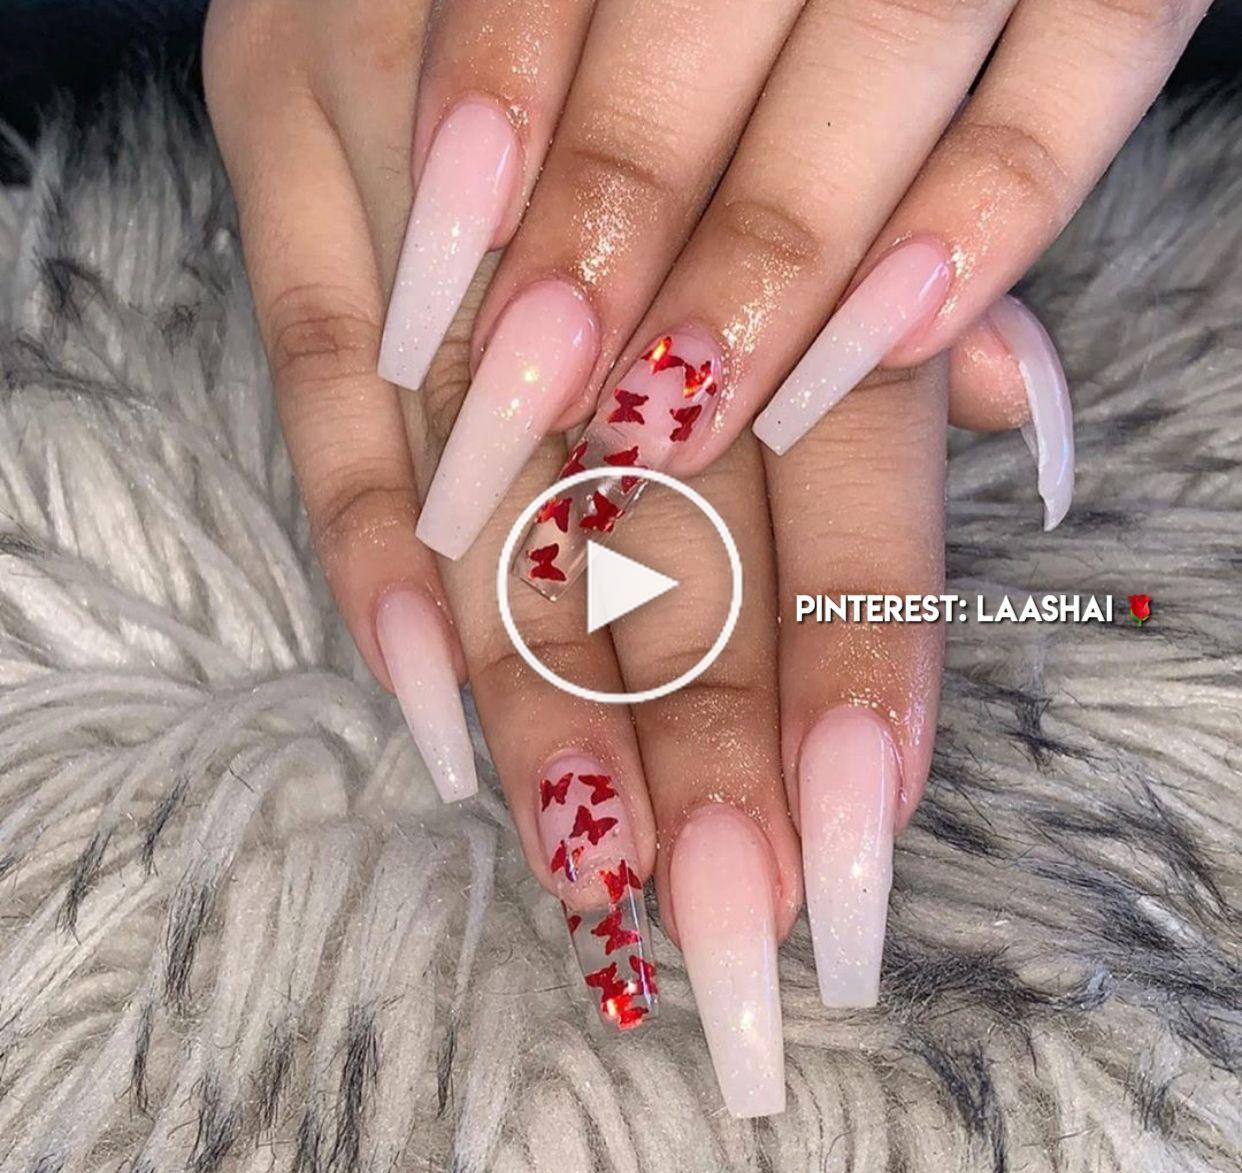 Pinterest Laashai Karens Magic Nails In 2020 Long Acrylic Nails Coffin Red Acrylic Nails Clear Acrylic Nails